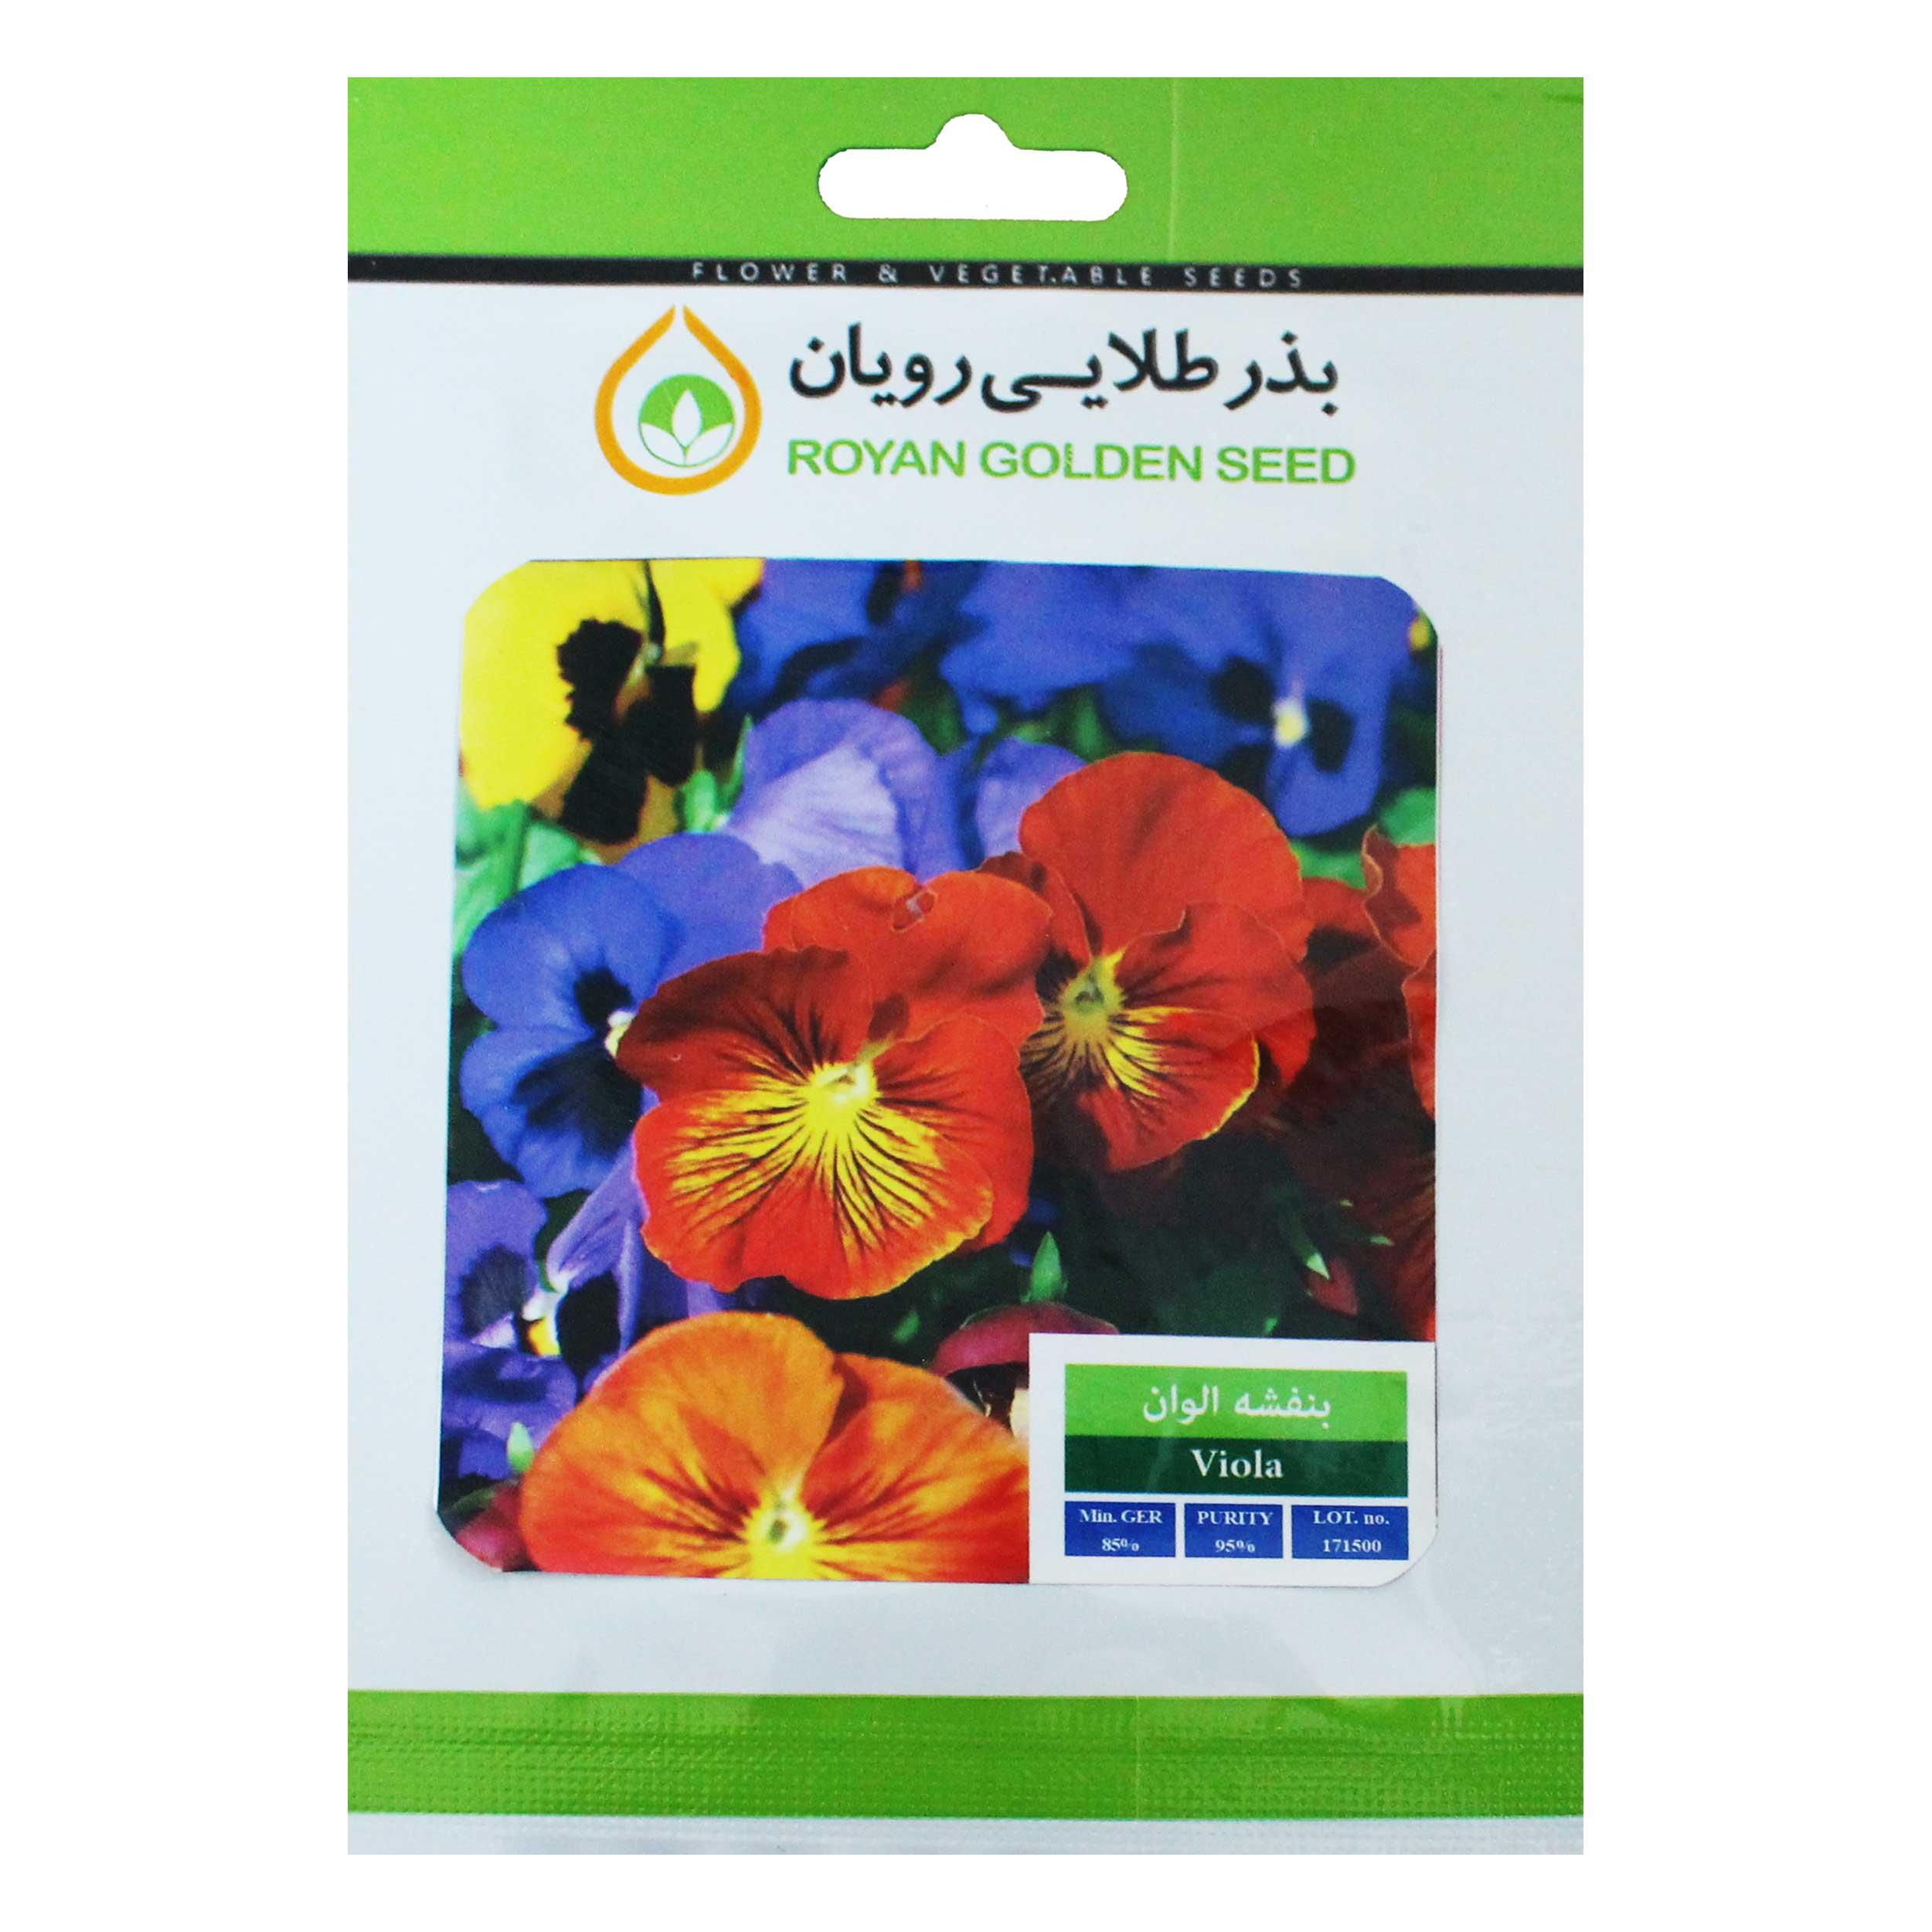 بذر گل بنفشه بذر طلایی رویان کد BZTR-008